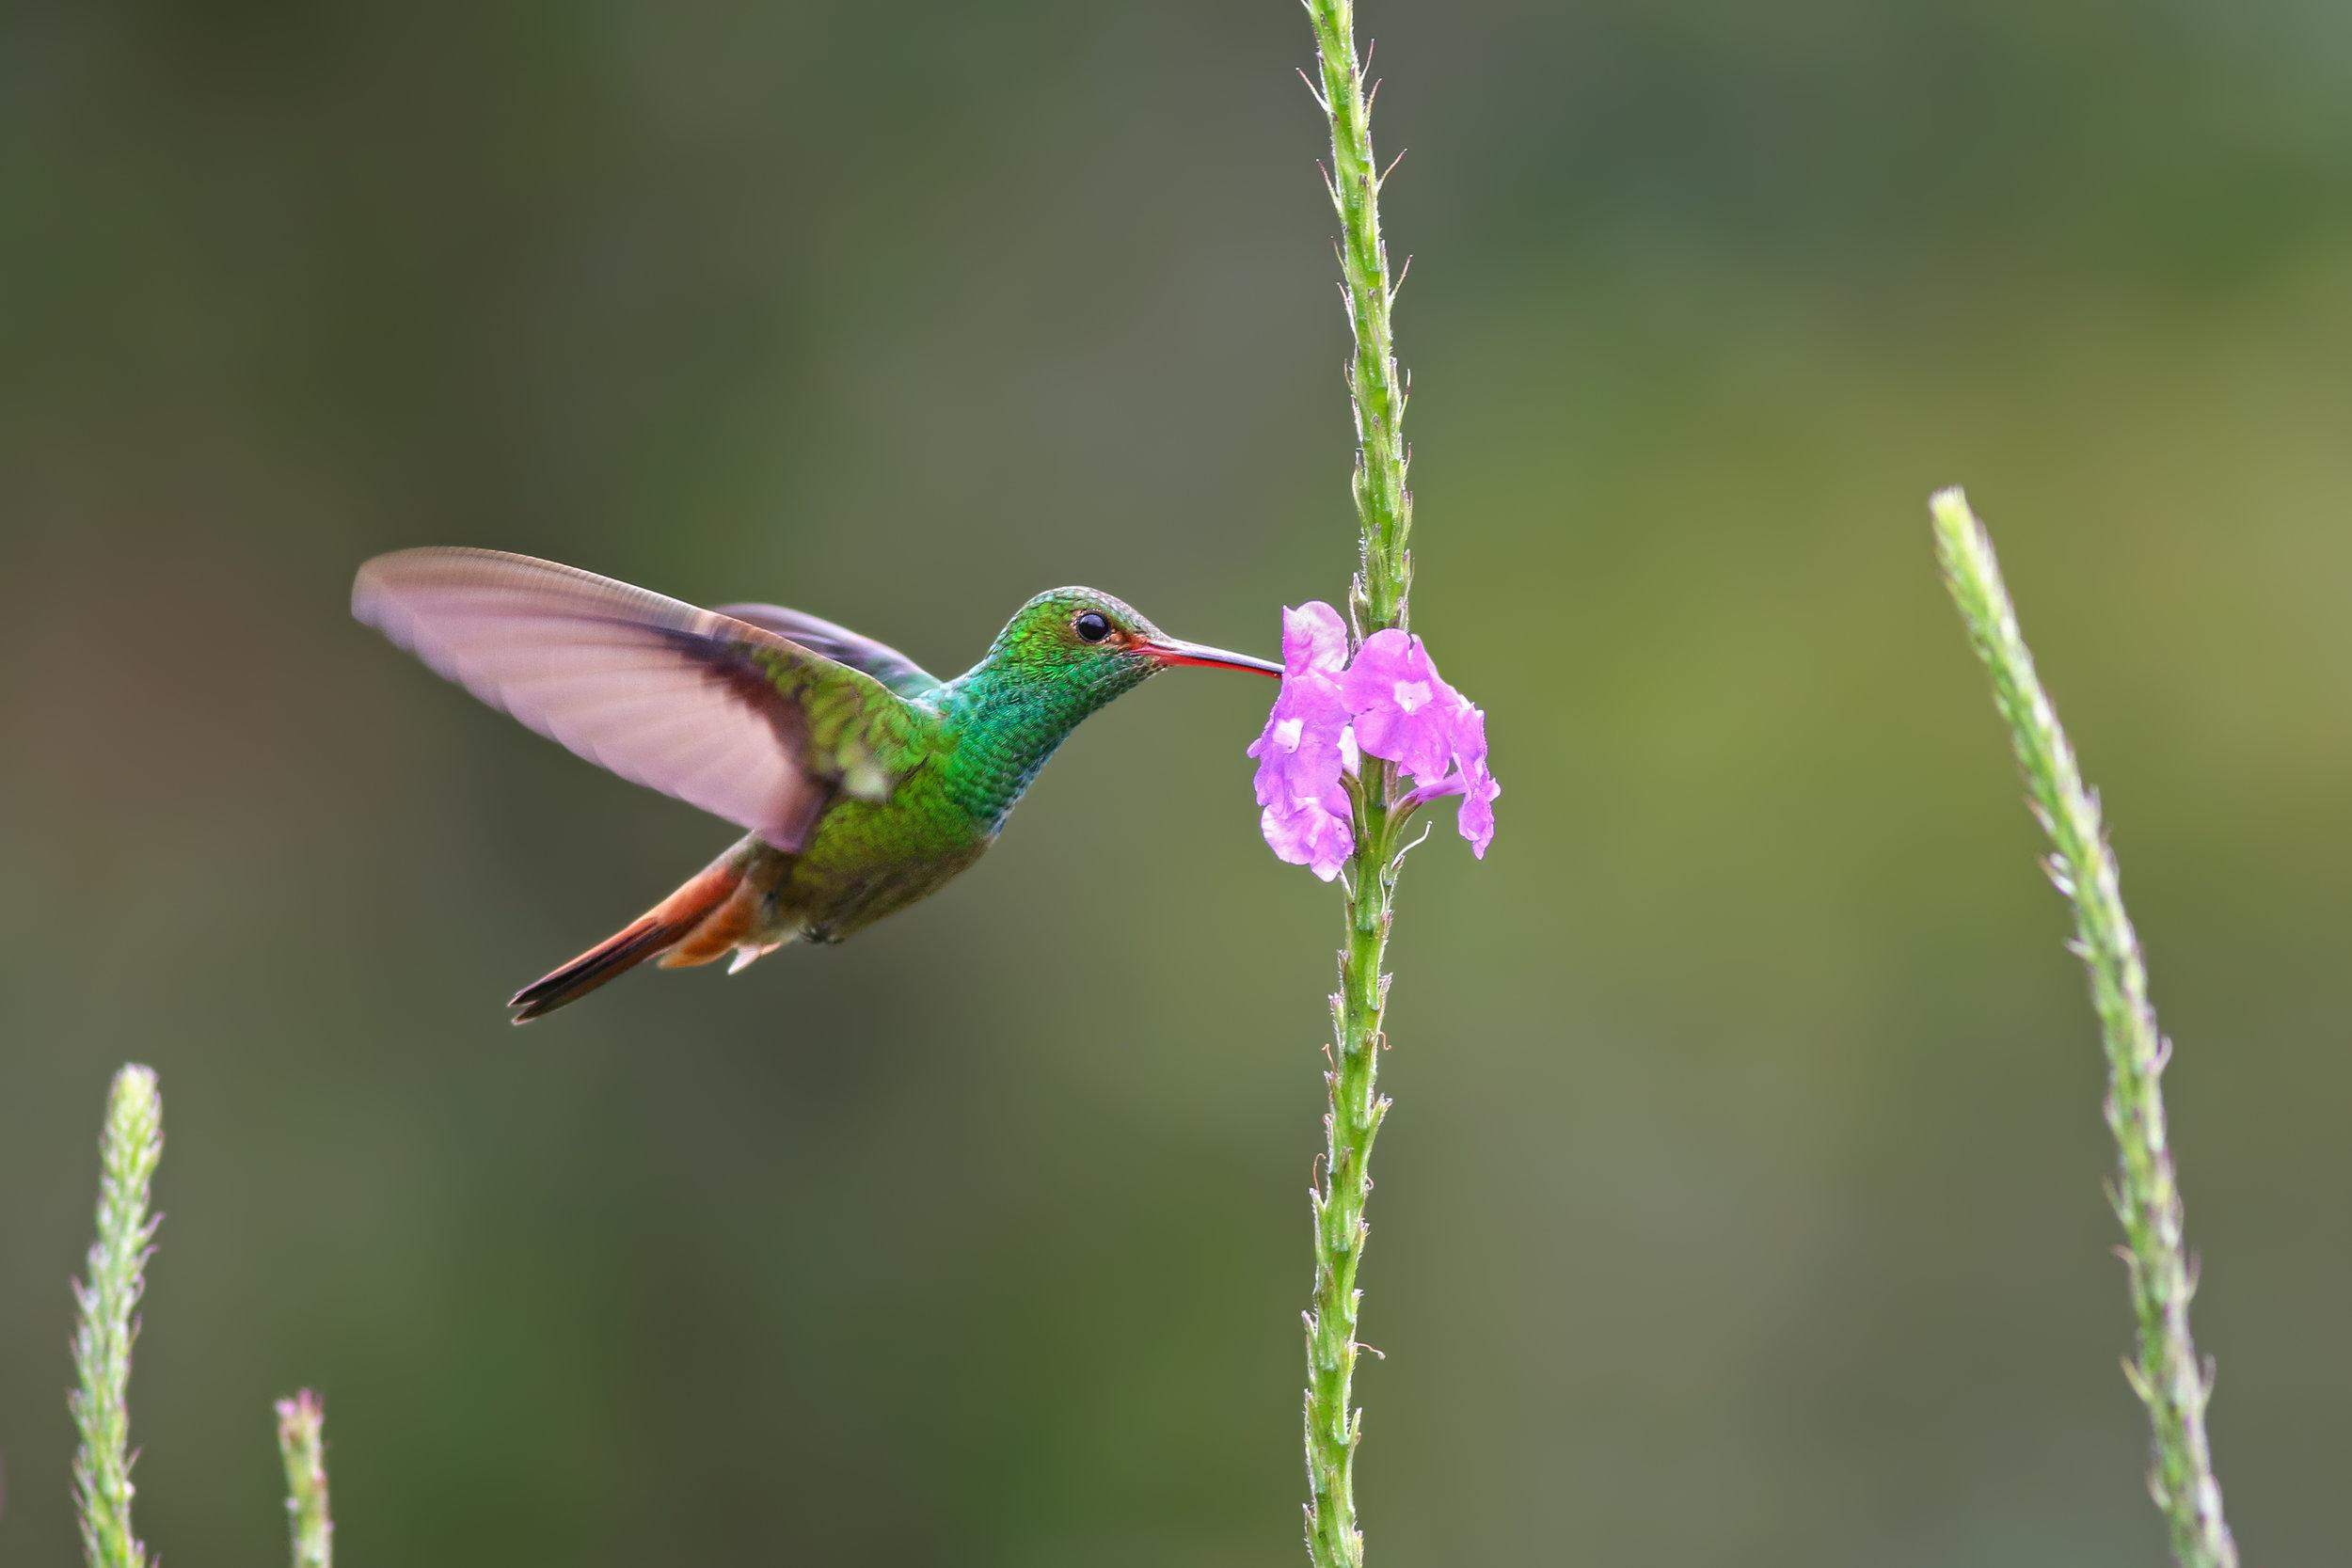 Roufus-tailed-Hummingbird-JPEG_web 2.jpg